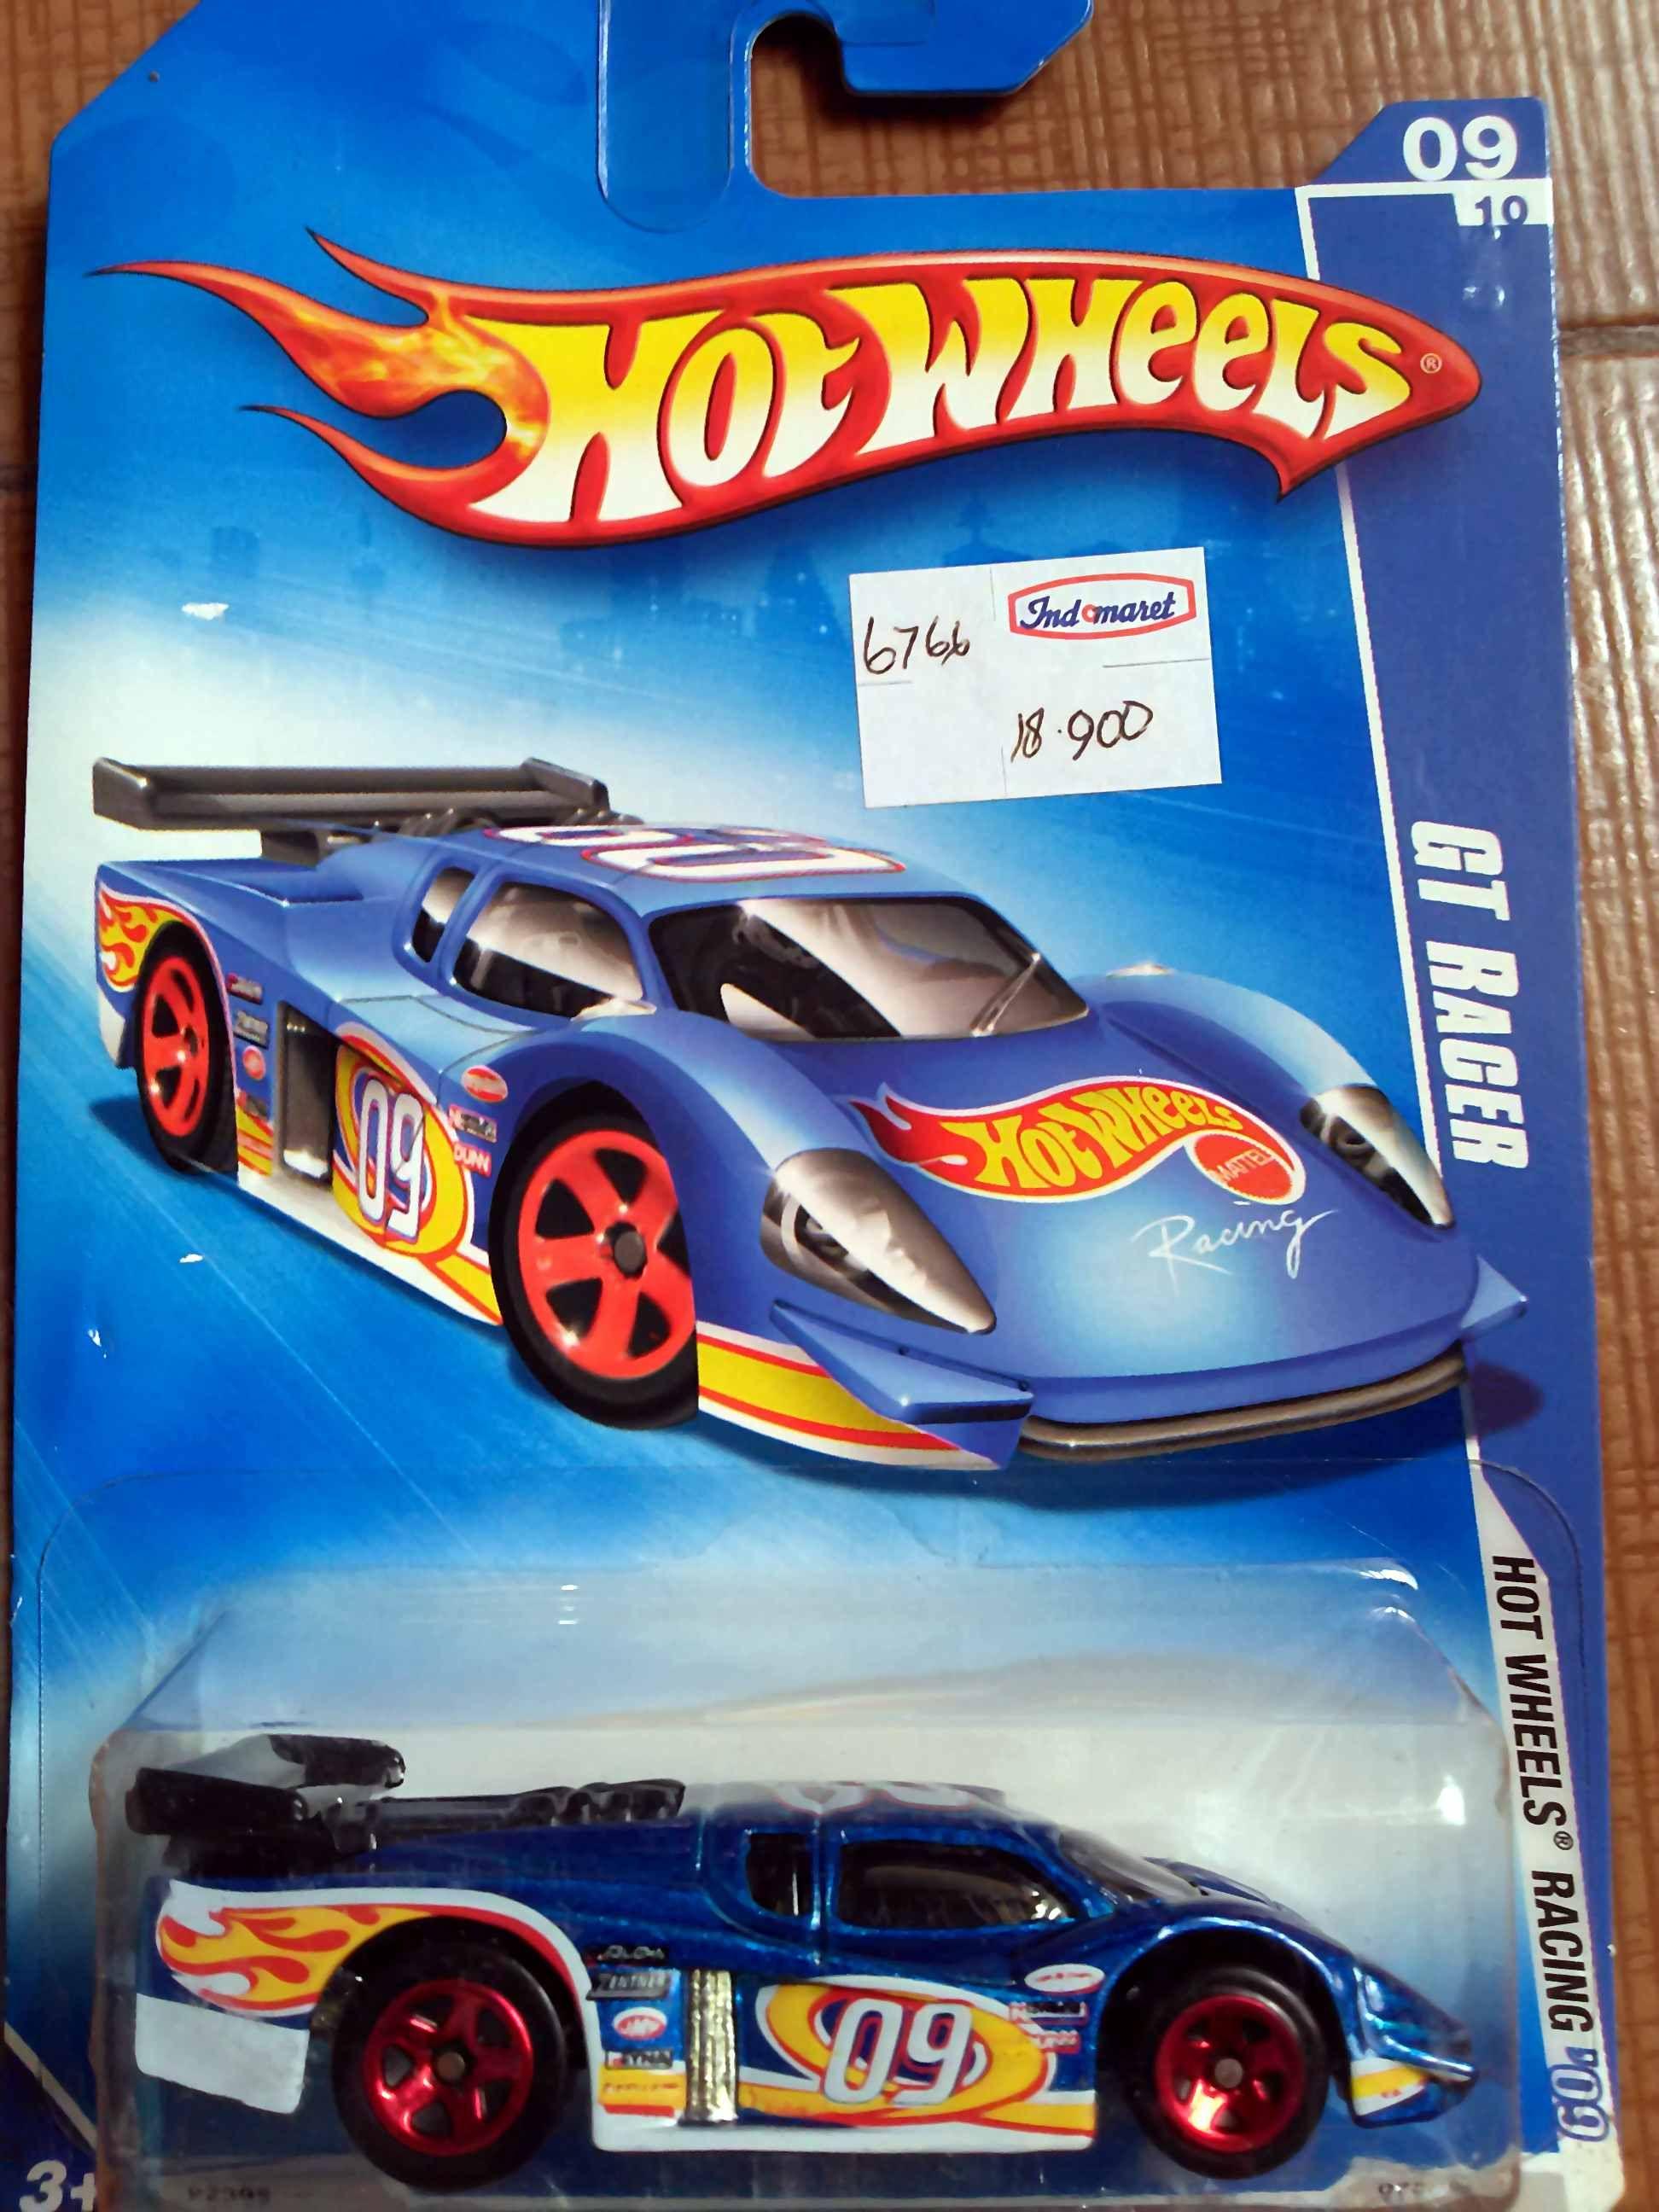 Hotwheels Gt Racer Hot Wheels Hot Wheels Races Hot Wheels Garage